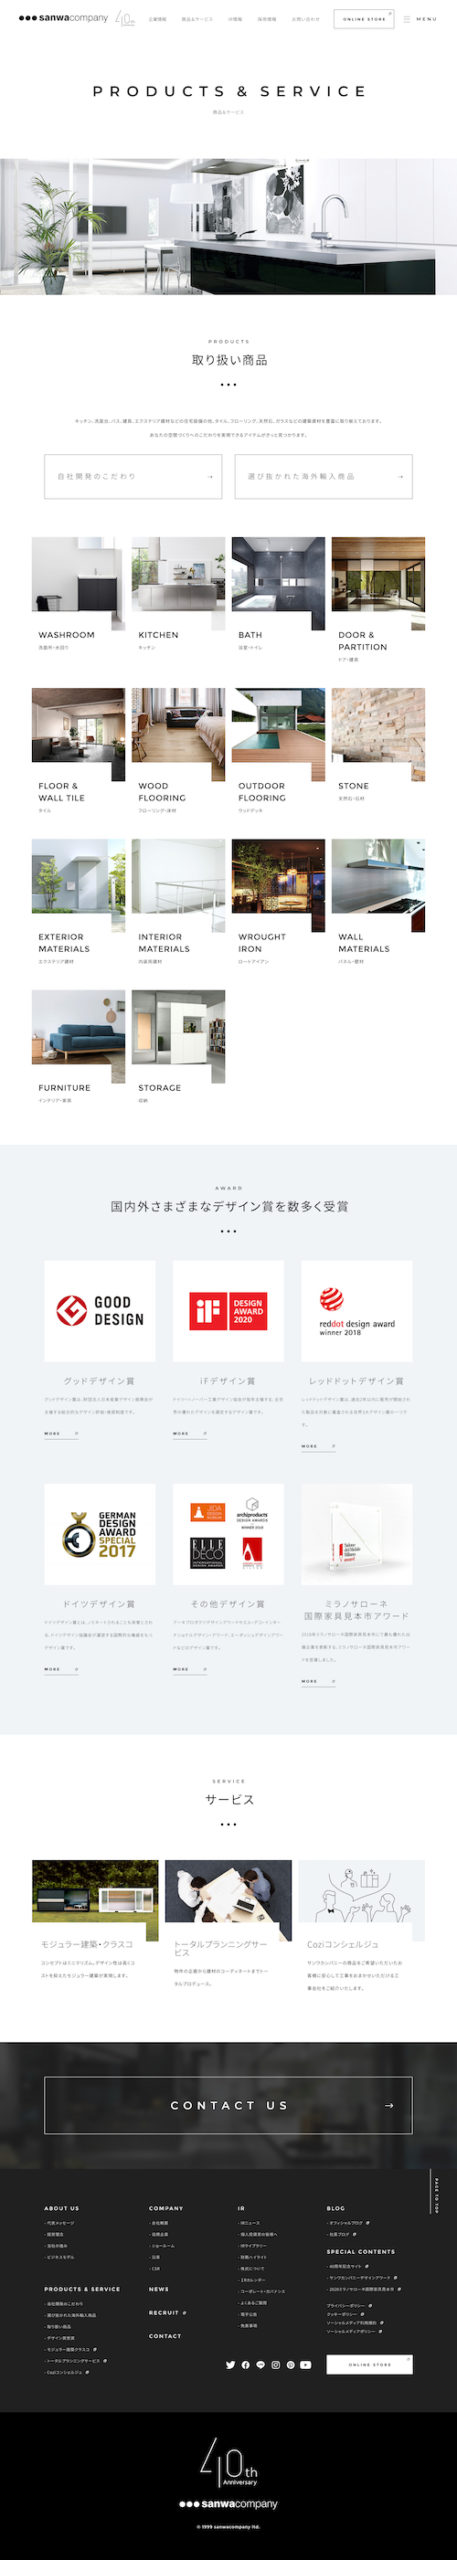 info-sanwacompany-product-service